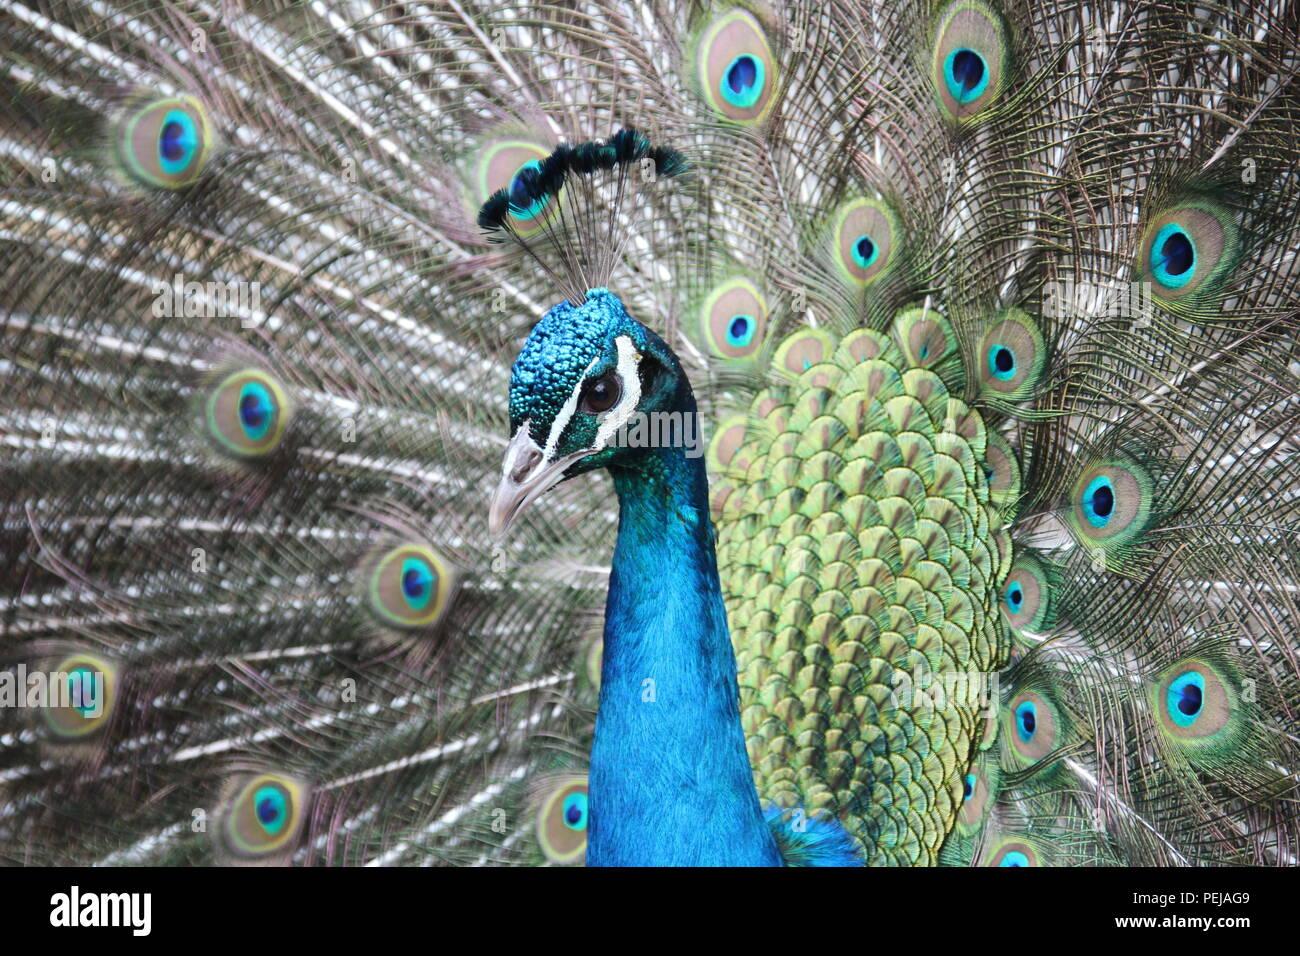 A regal Peacock - Stock Image